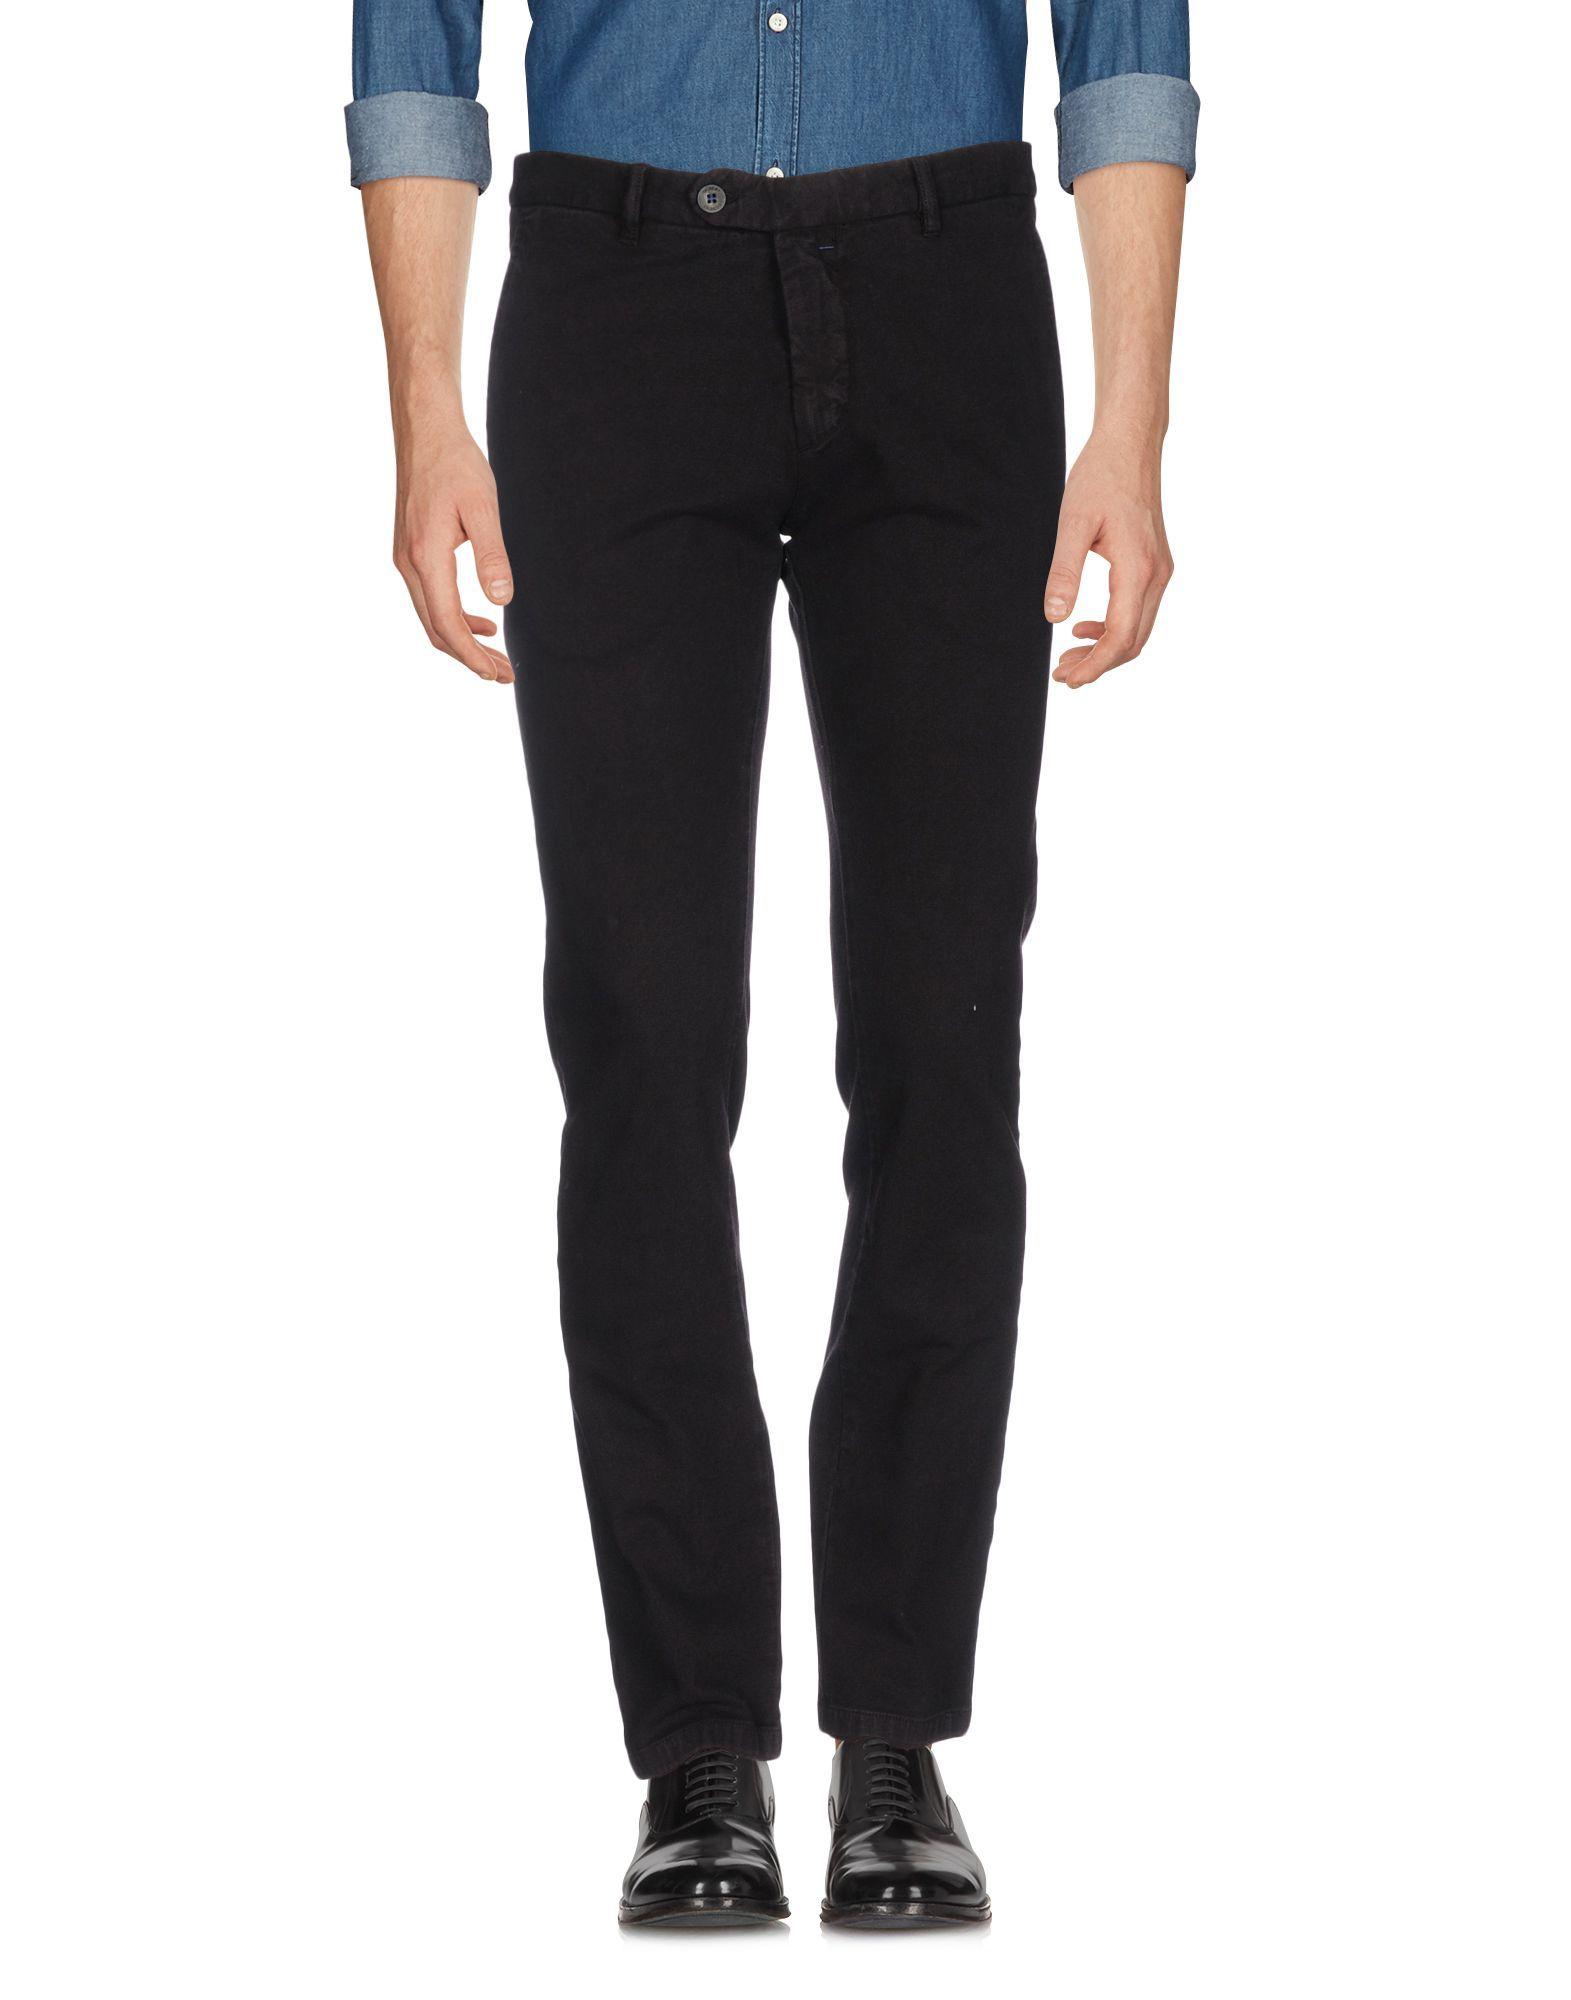 TROUSERS - Casual trousers J.W. Brine J554cFCC